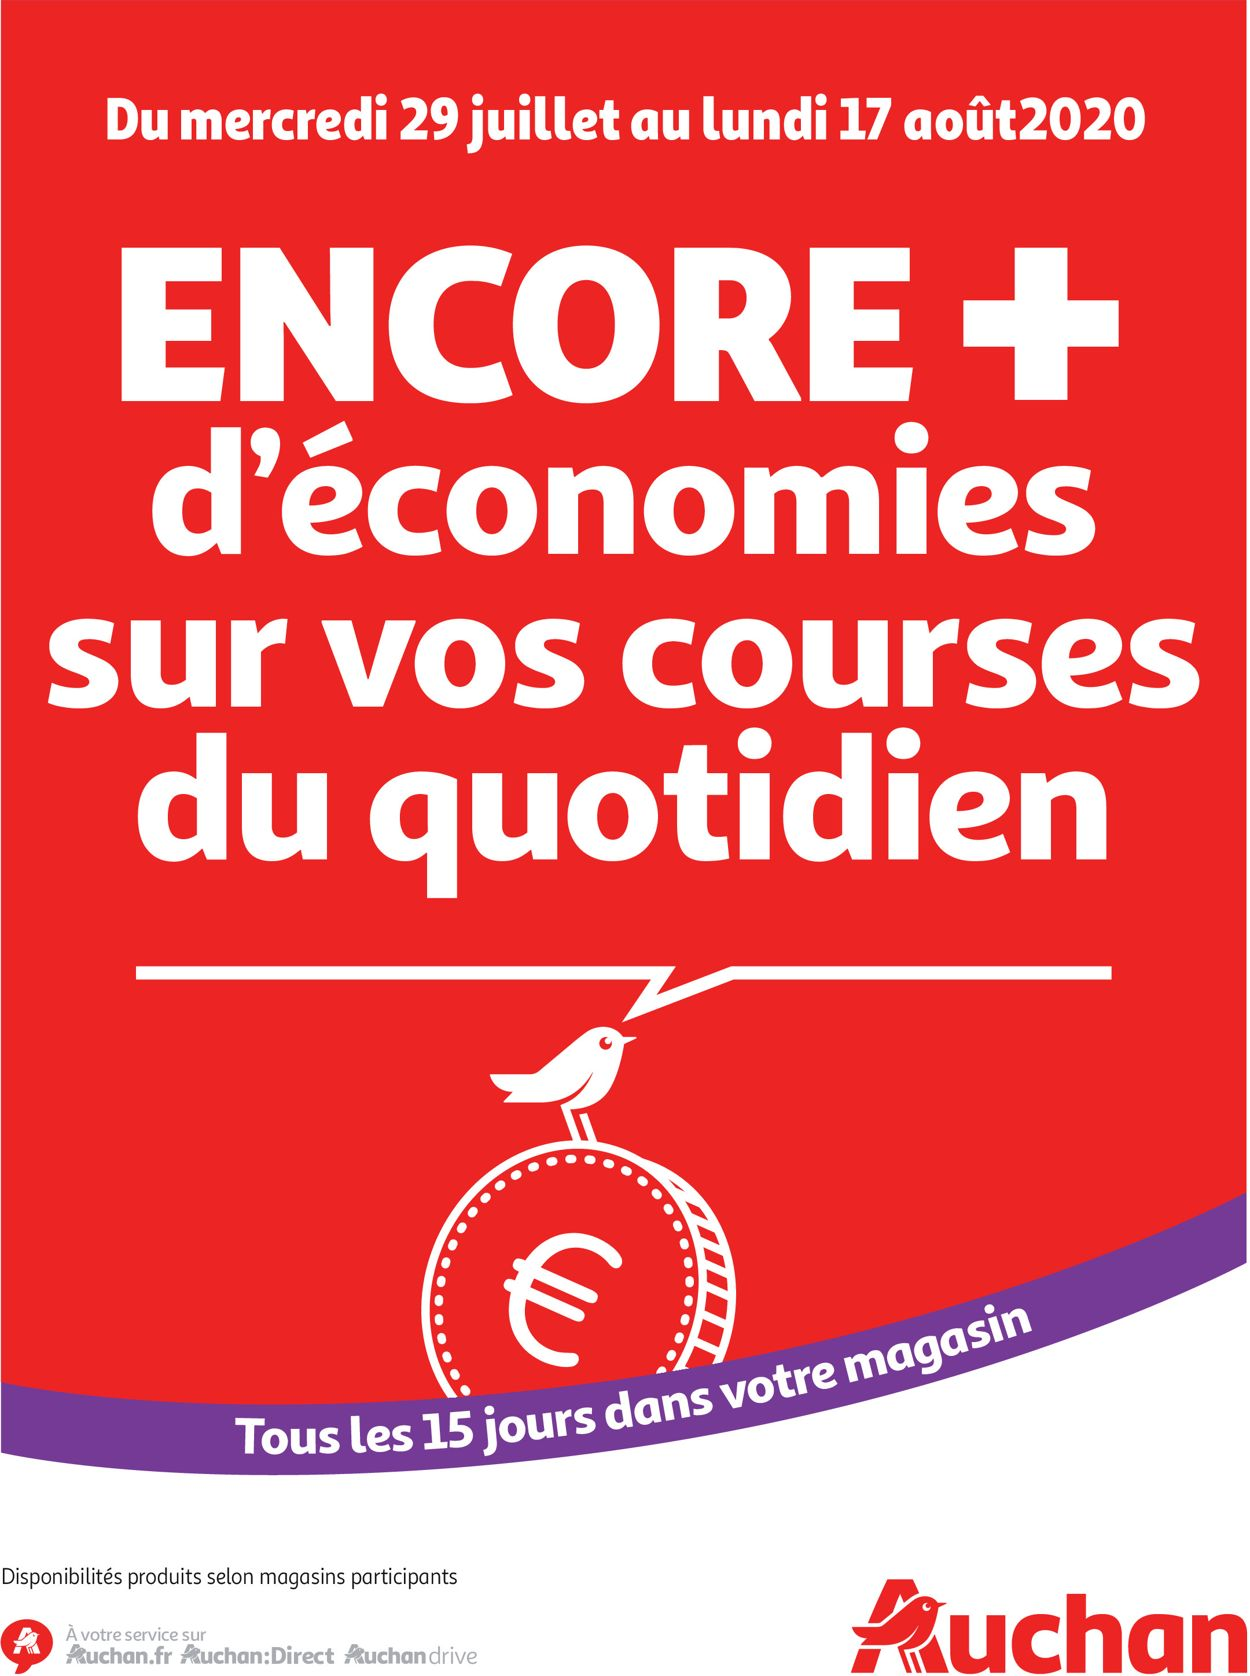 Auchan Catalogue - 29.07-17.08.2020